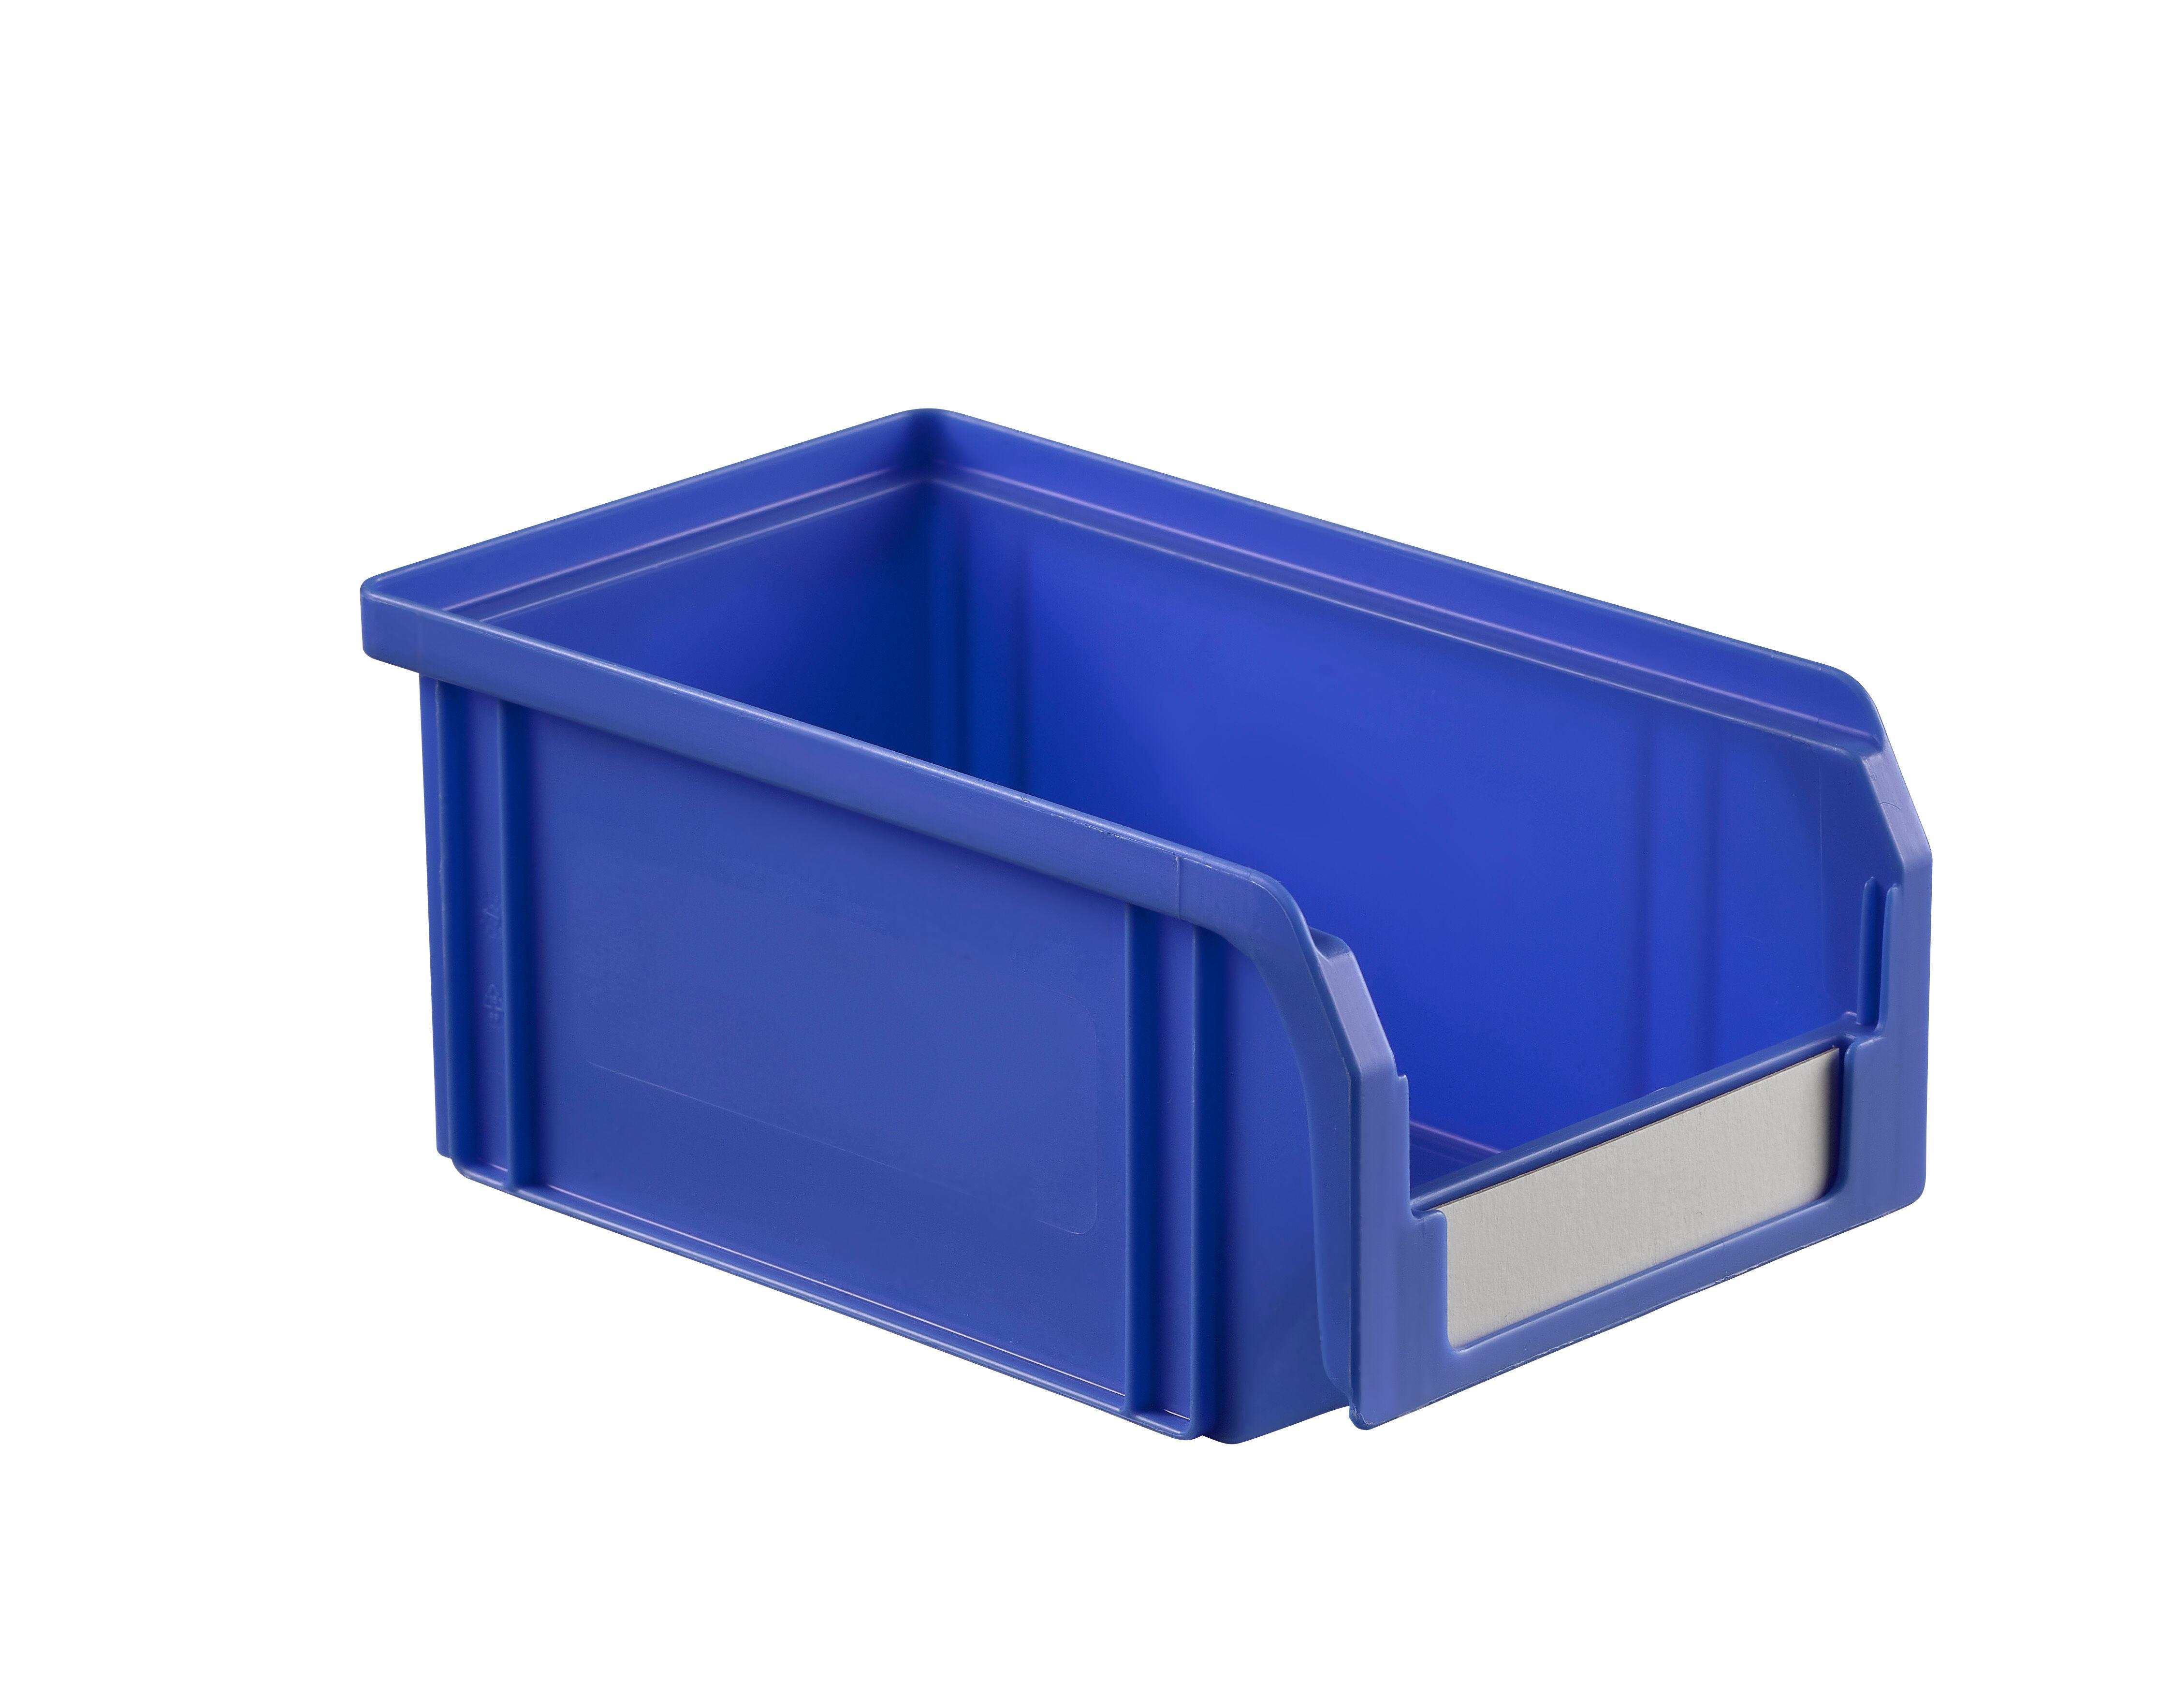 SETAM Bac à bec en plastique 1 litre coloris bleu